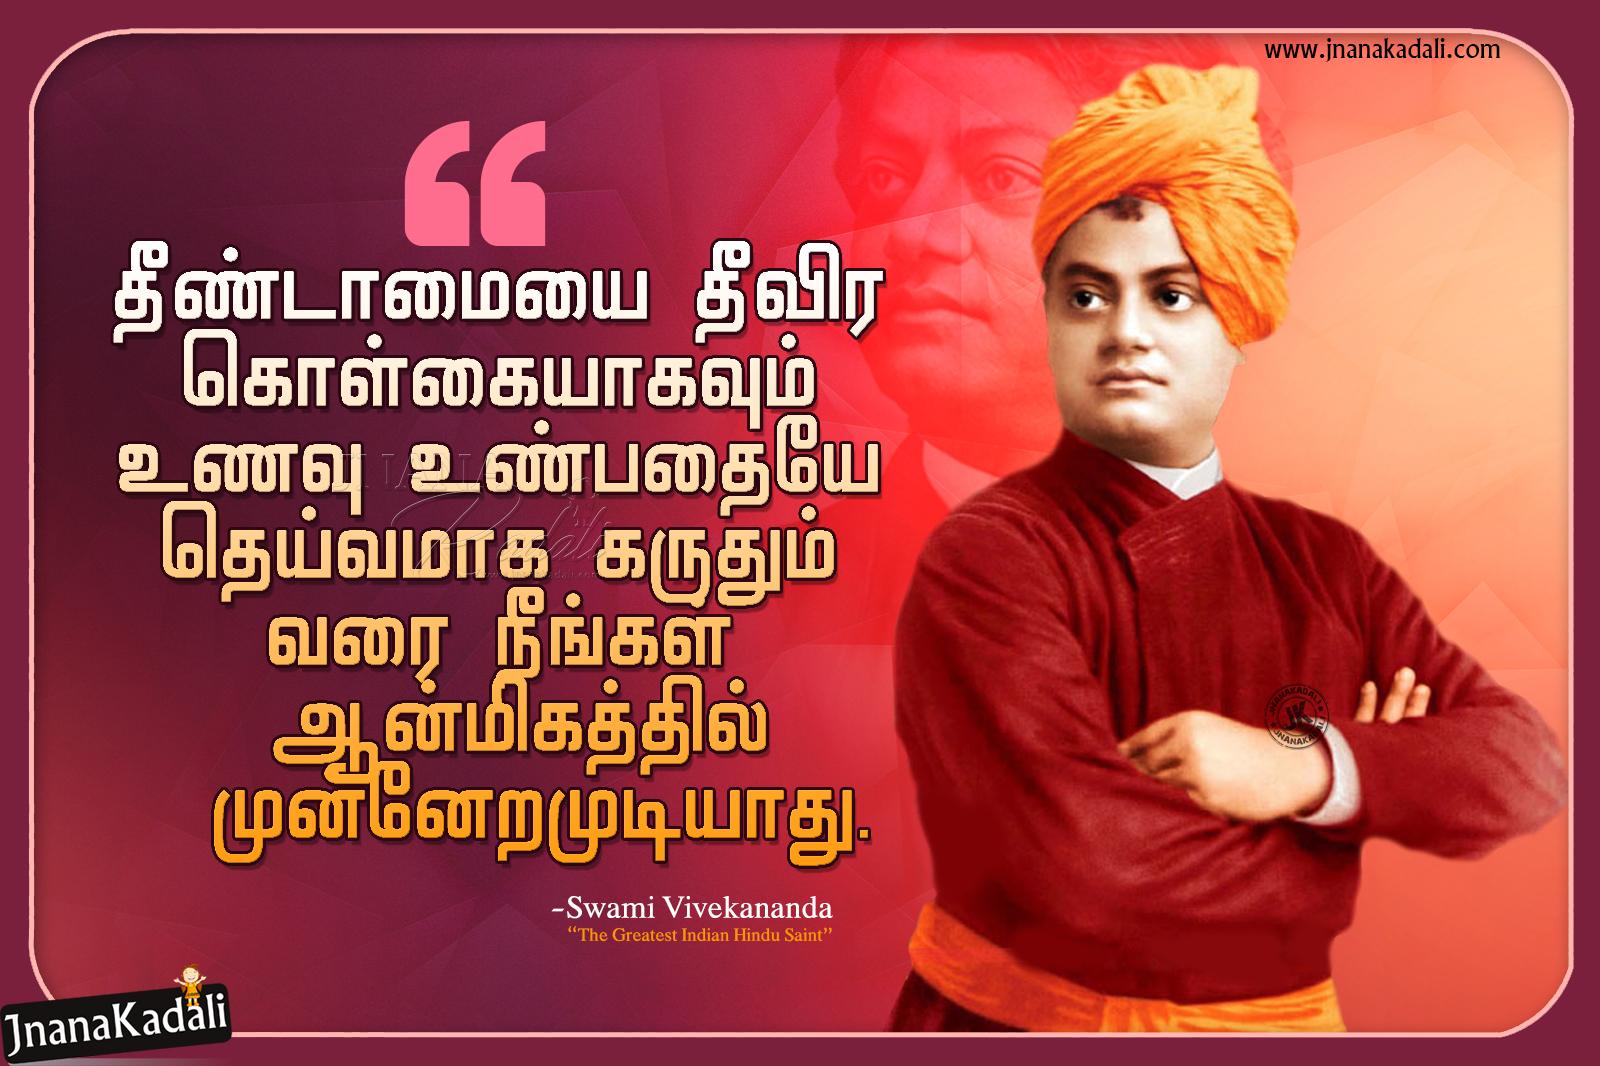 swami vivekananda motivational words in tamil swami vivekananda hd wallpapers with motivational youth quotes brainysms tamil swami vivekananda hd wallpapers